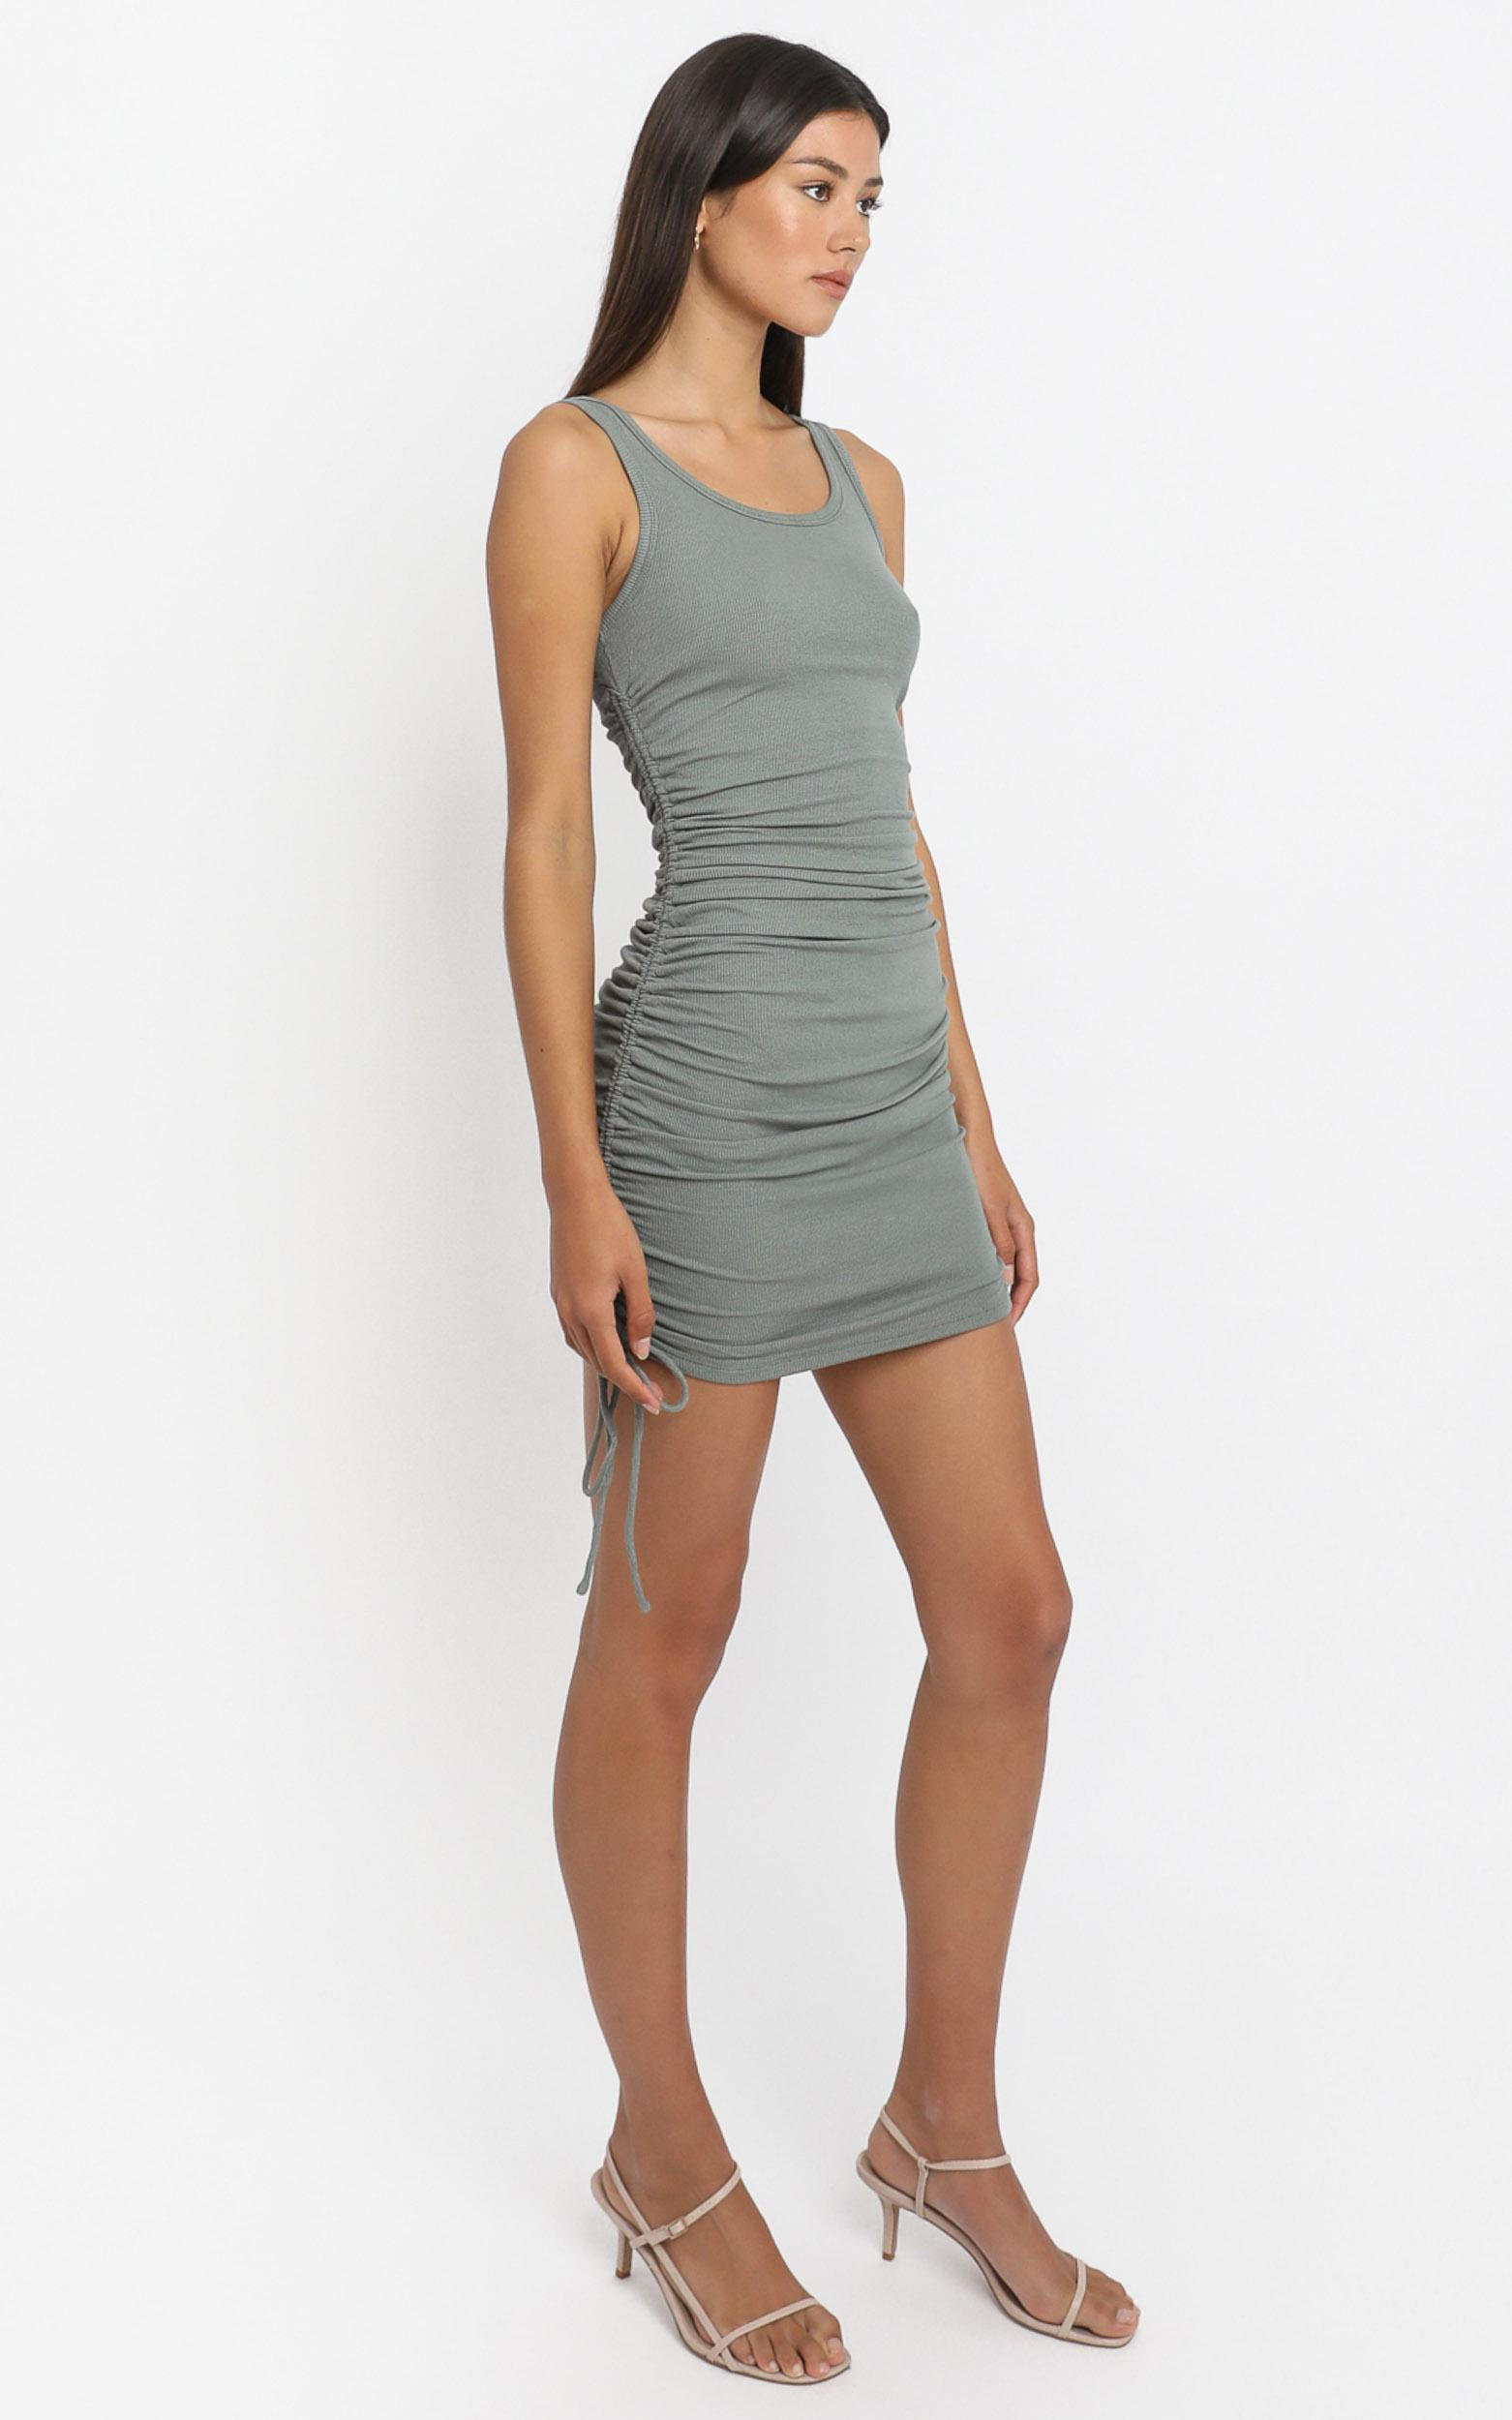 Kailey Dress in Khaki - 6 (XS), Khaki, hi-res image number null